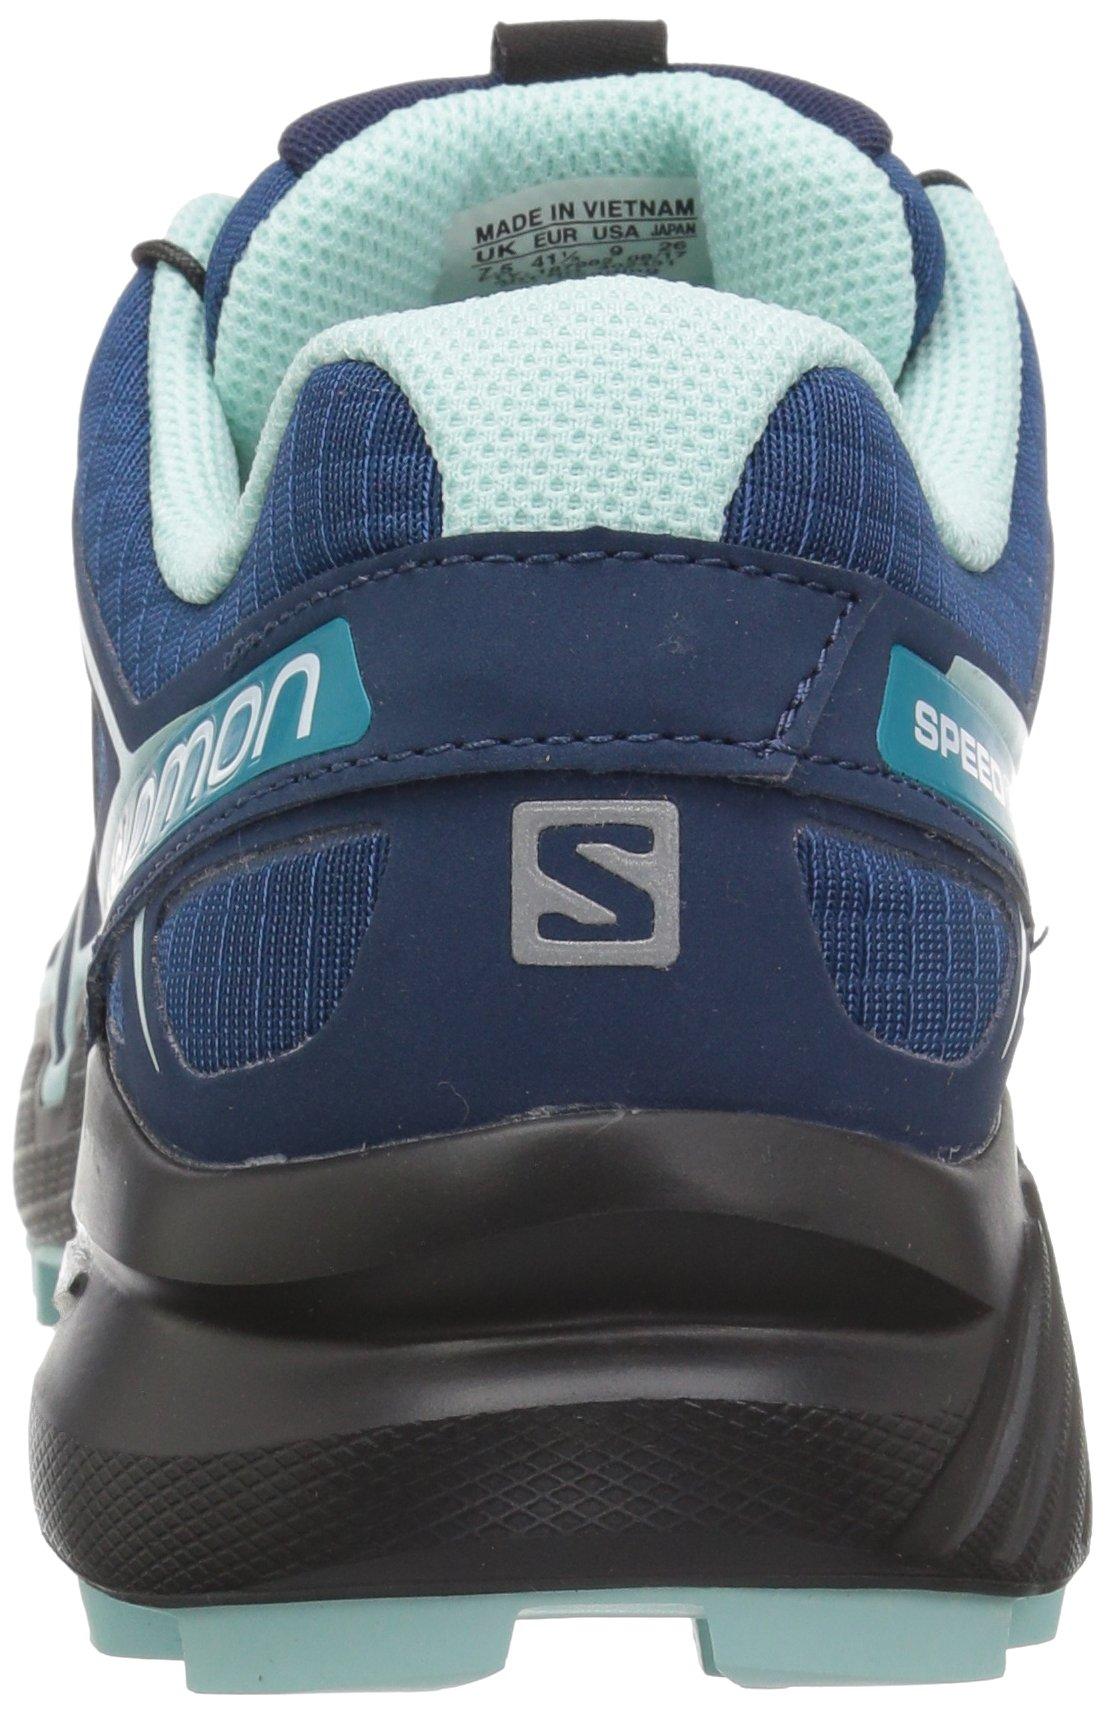 fdbe04a4268 Salomon Women s Speedcross 4 W Trail Running Shoe Poseidon 5.5 M US -  L40243100-Q587-5.5 M US   Trail Running   Clothing